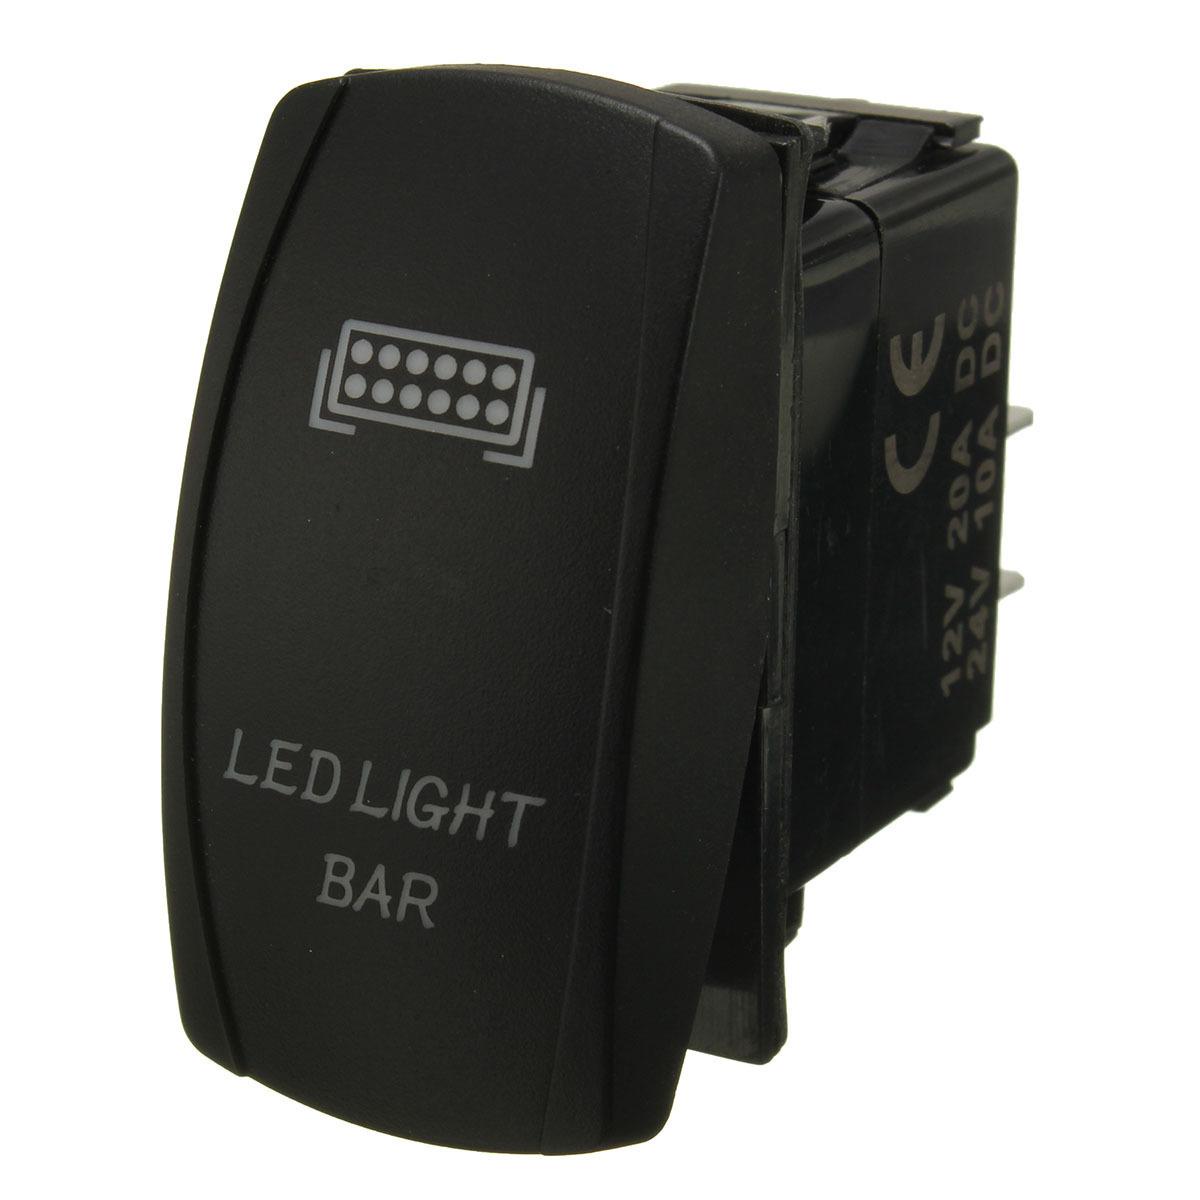 led light bar on off rocker switch wiring harness kit 40a relay led light bar on off rocker switch wiring harness kit 40a relay for atv jeep lazada ph